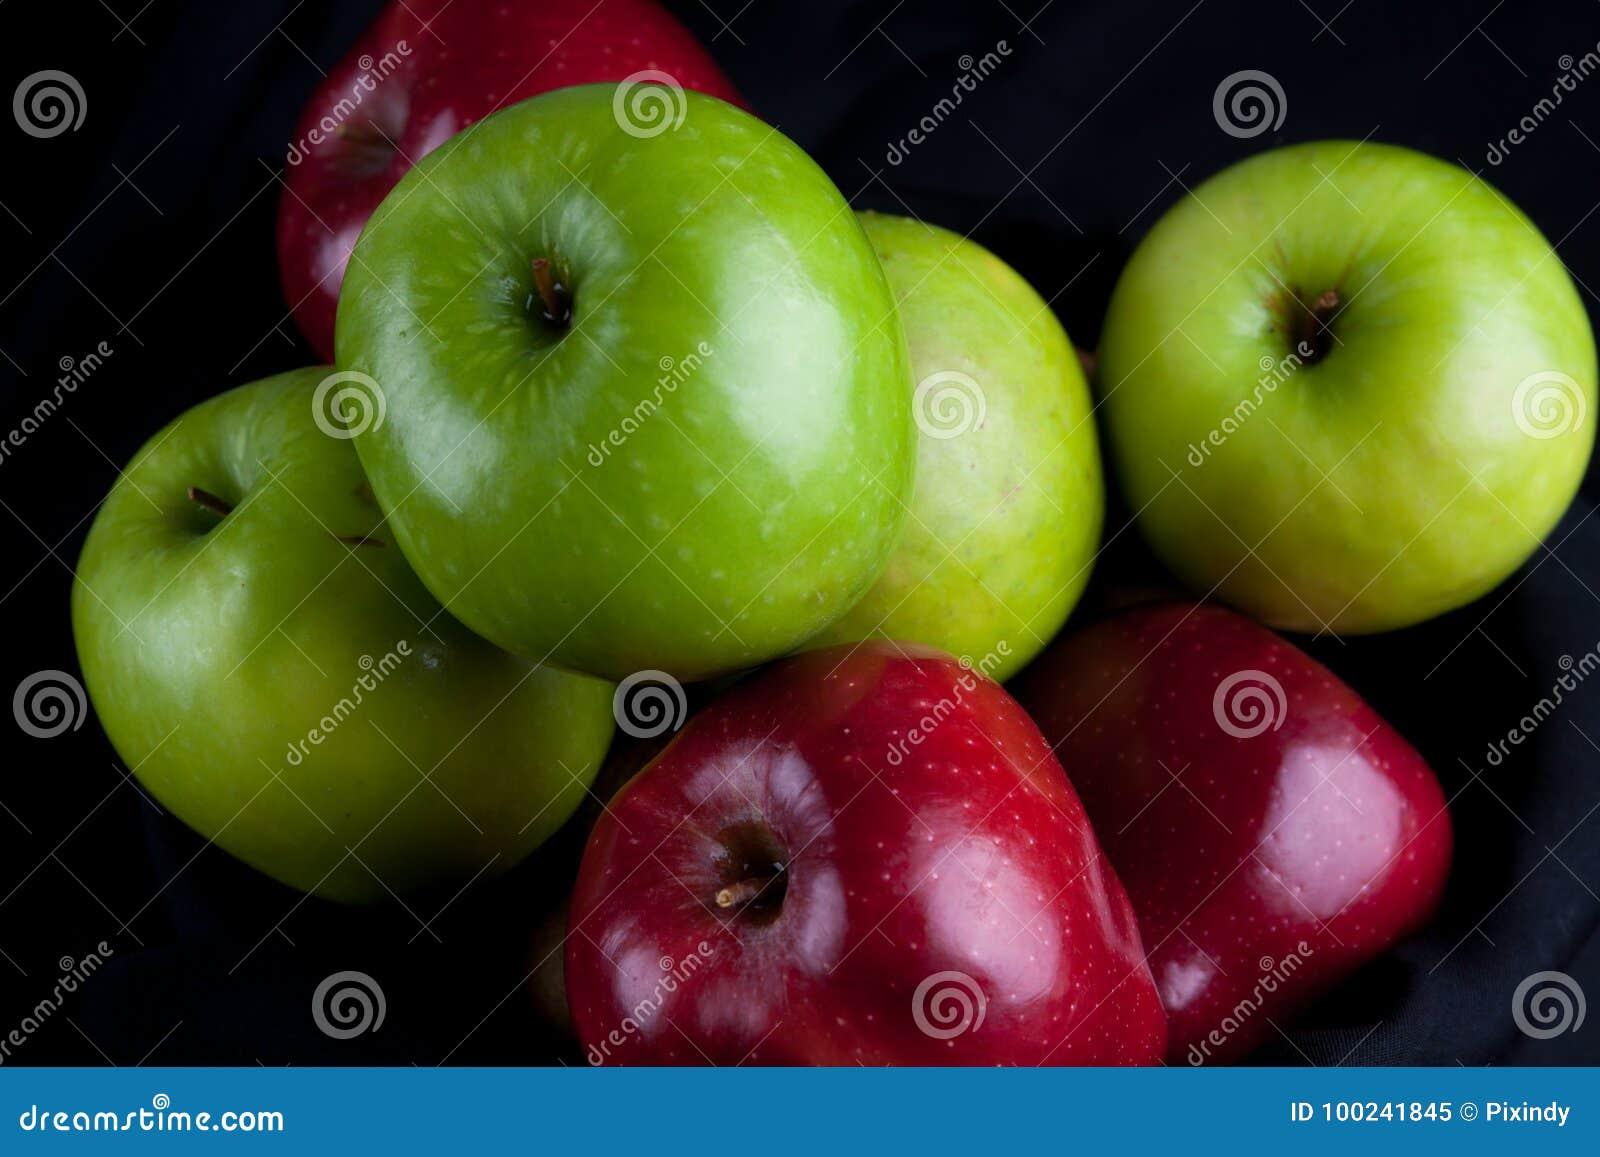 comparison of apple and black berry Blackberry priv vs apple iphone 6s mobile phones comparison - compare size, camera, specs, features, price of blackberry priv with apple iphone 6s.